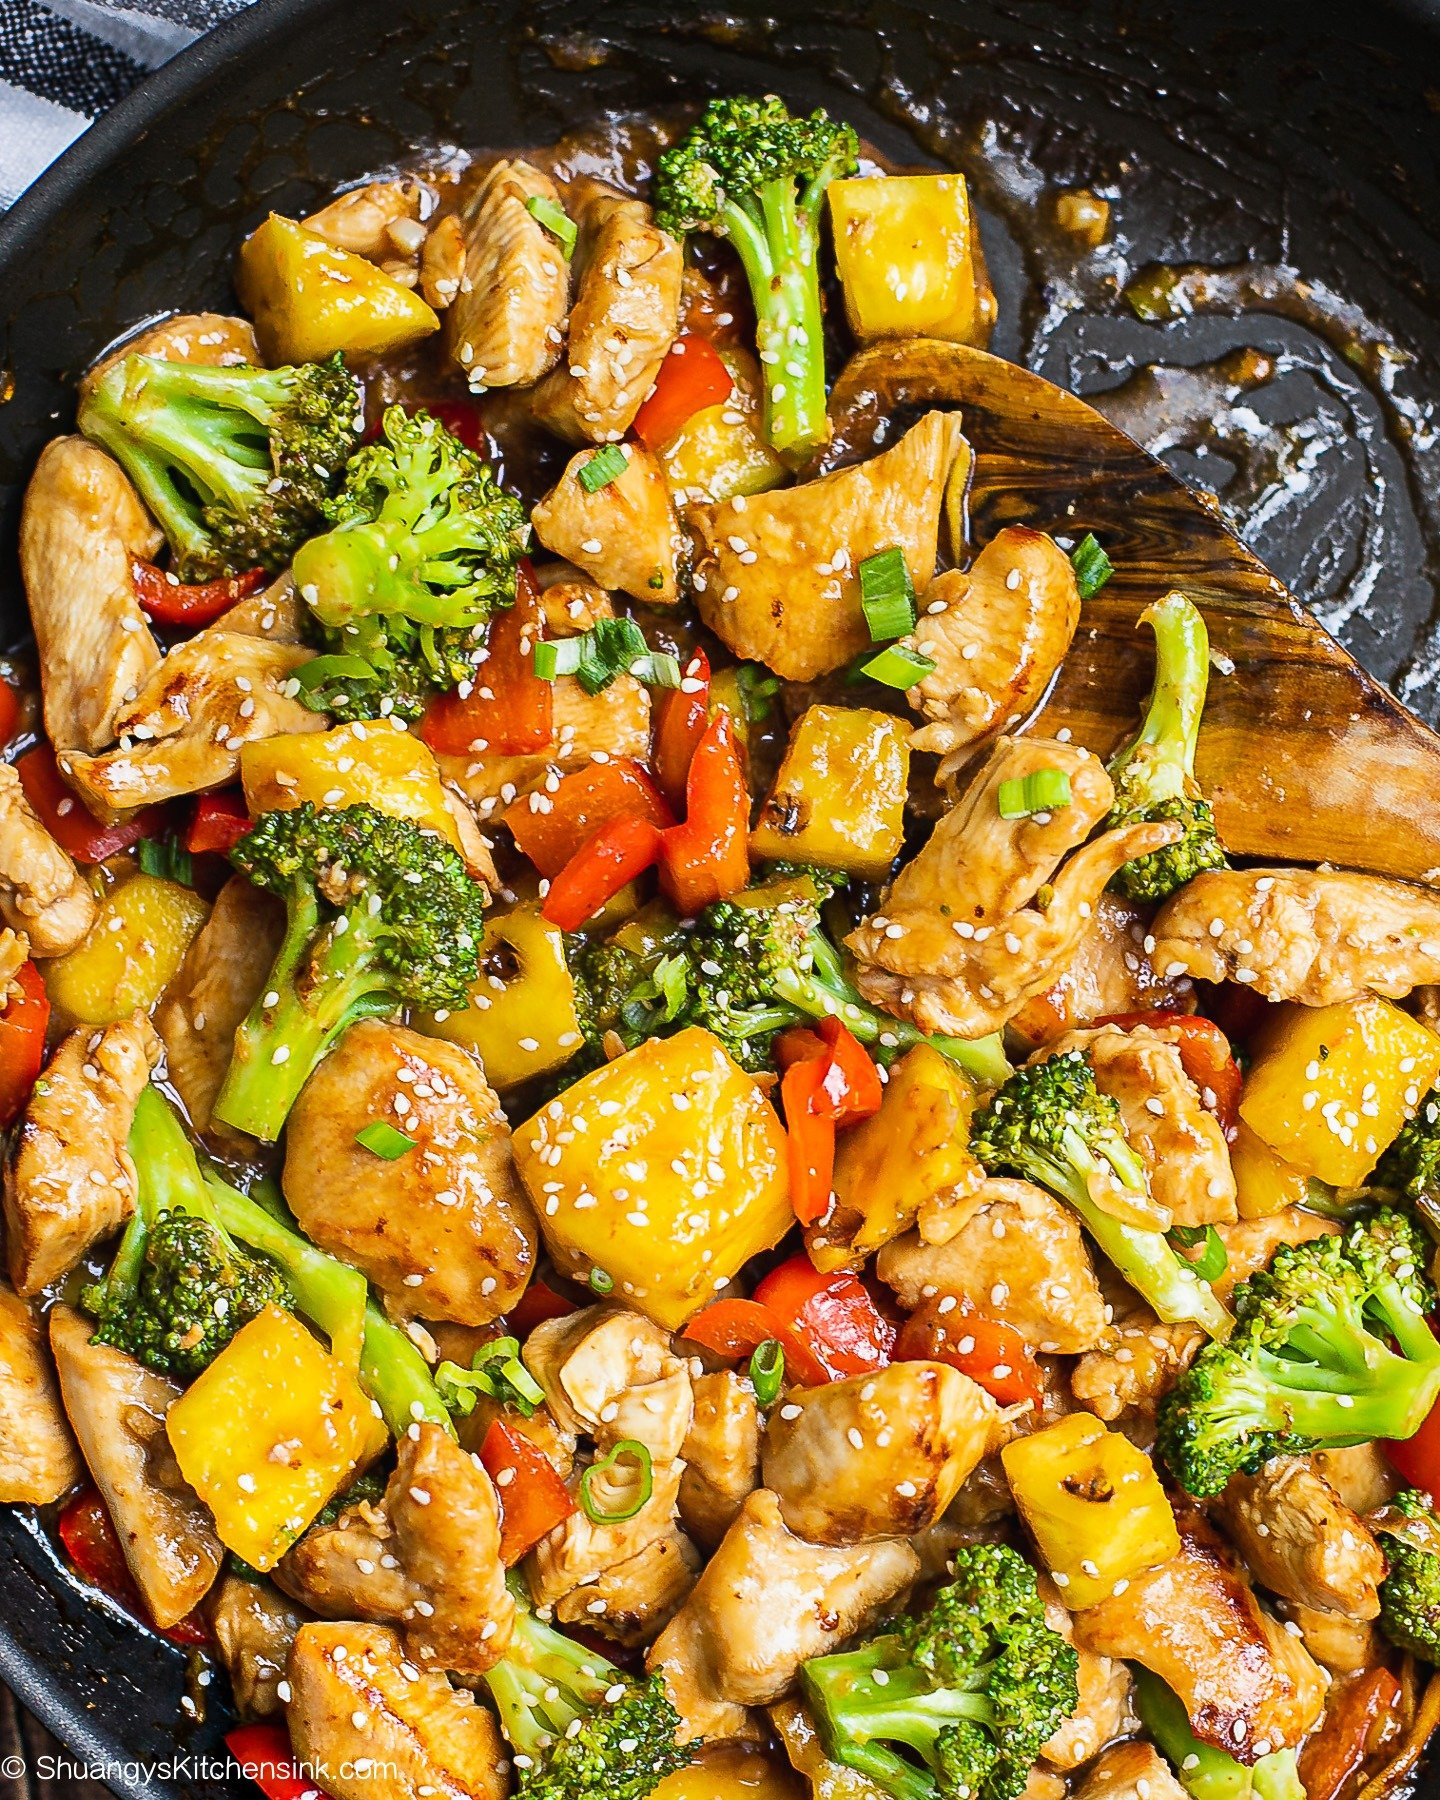 a stir fry of veggies, fruit and chicken glazed with teriyaki